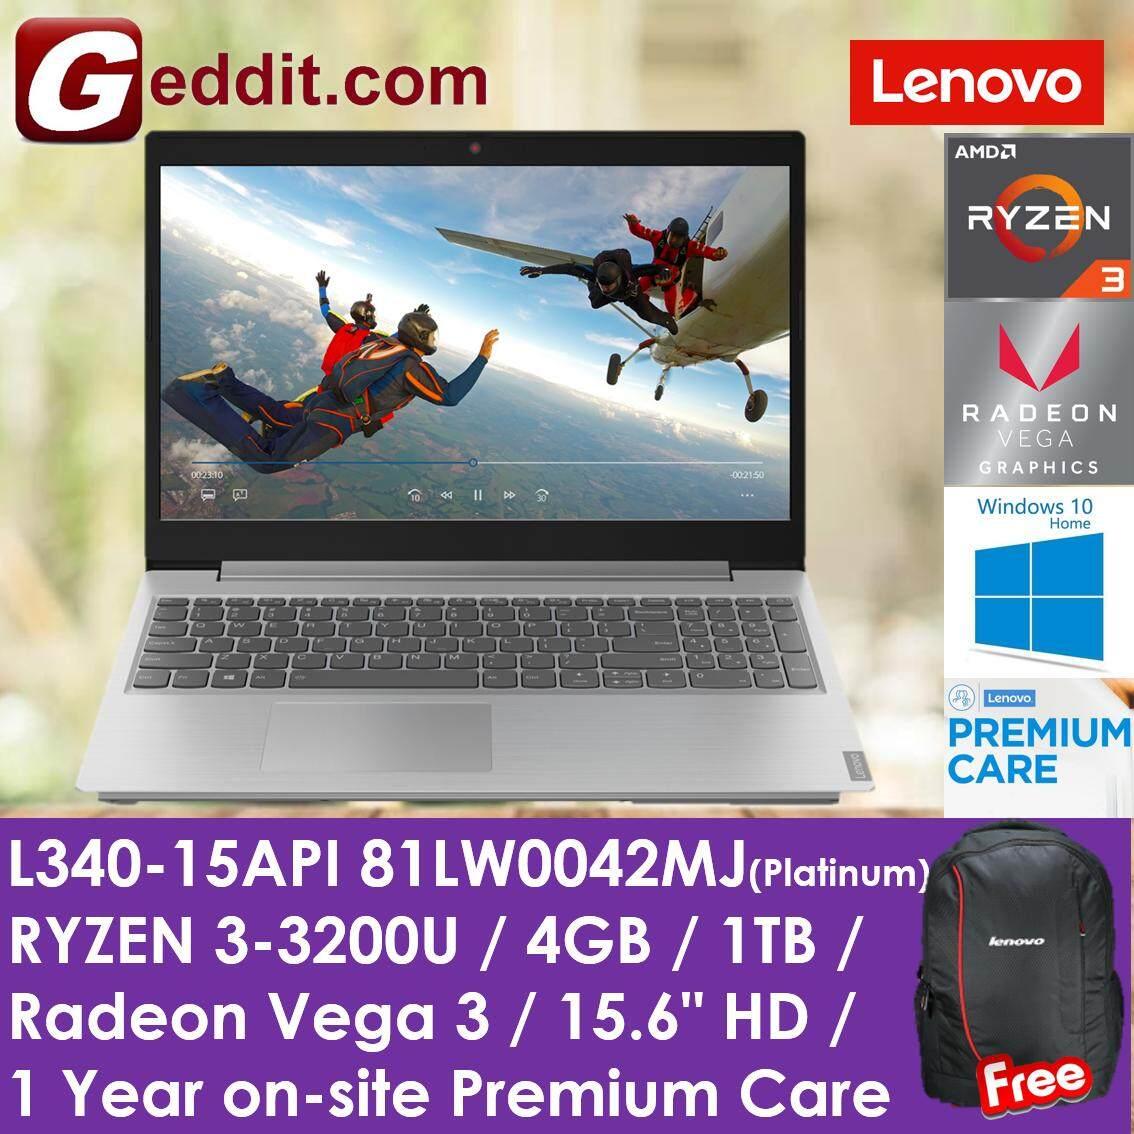 LENOVO L340-15API 81LW0042MJ (RYZEN 3-3200U,4GB,1TB,INTEGRATED GRAPHIC,WIN10,15.6,1YR ONSITE) FREE BACKPACK Malaysia